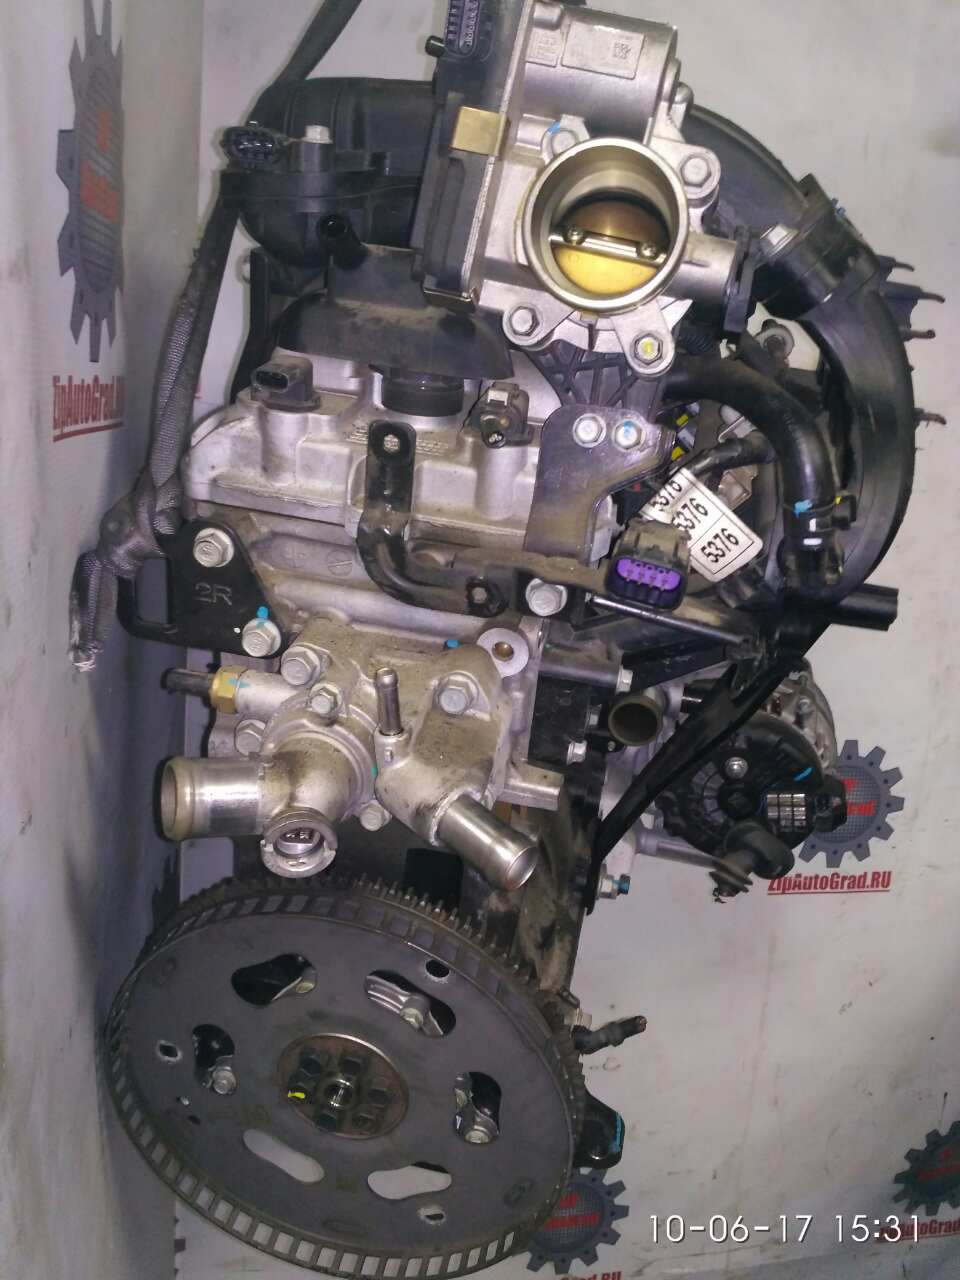 Двигатель Chevrolet Spark. Кузов: NEW. B10D2. , 1.0л.Дата выпуска: 2010-.  фото 3